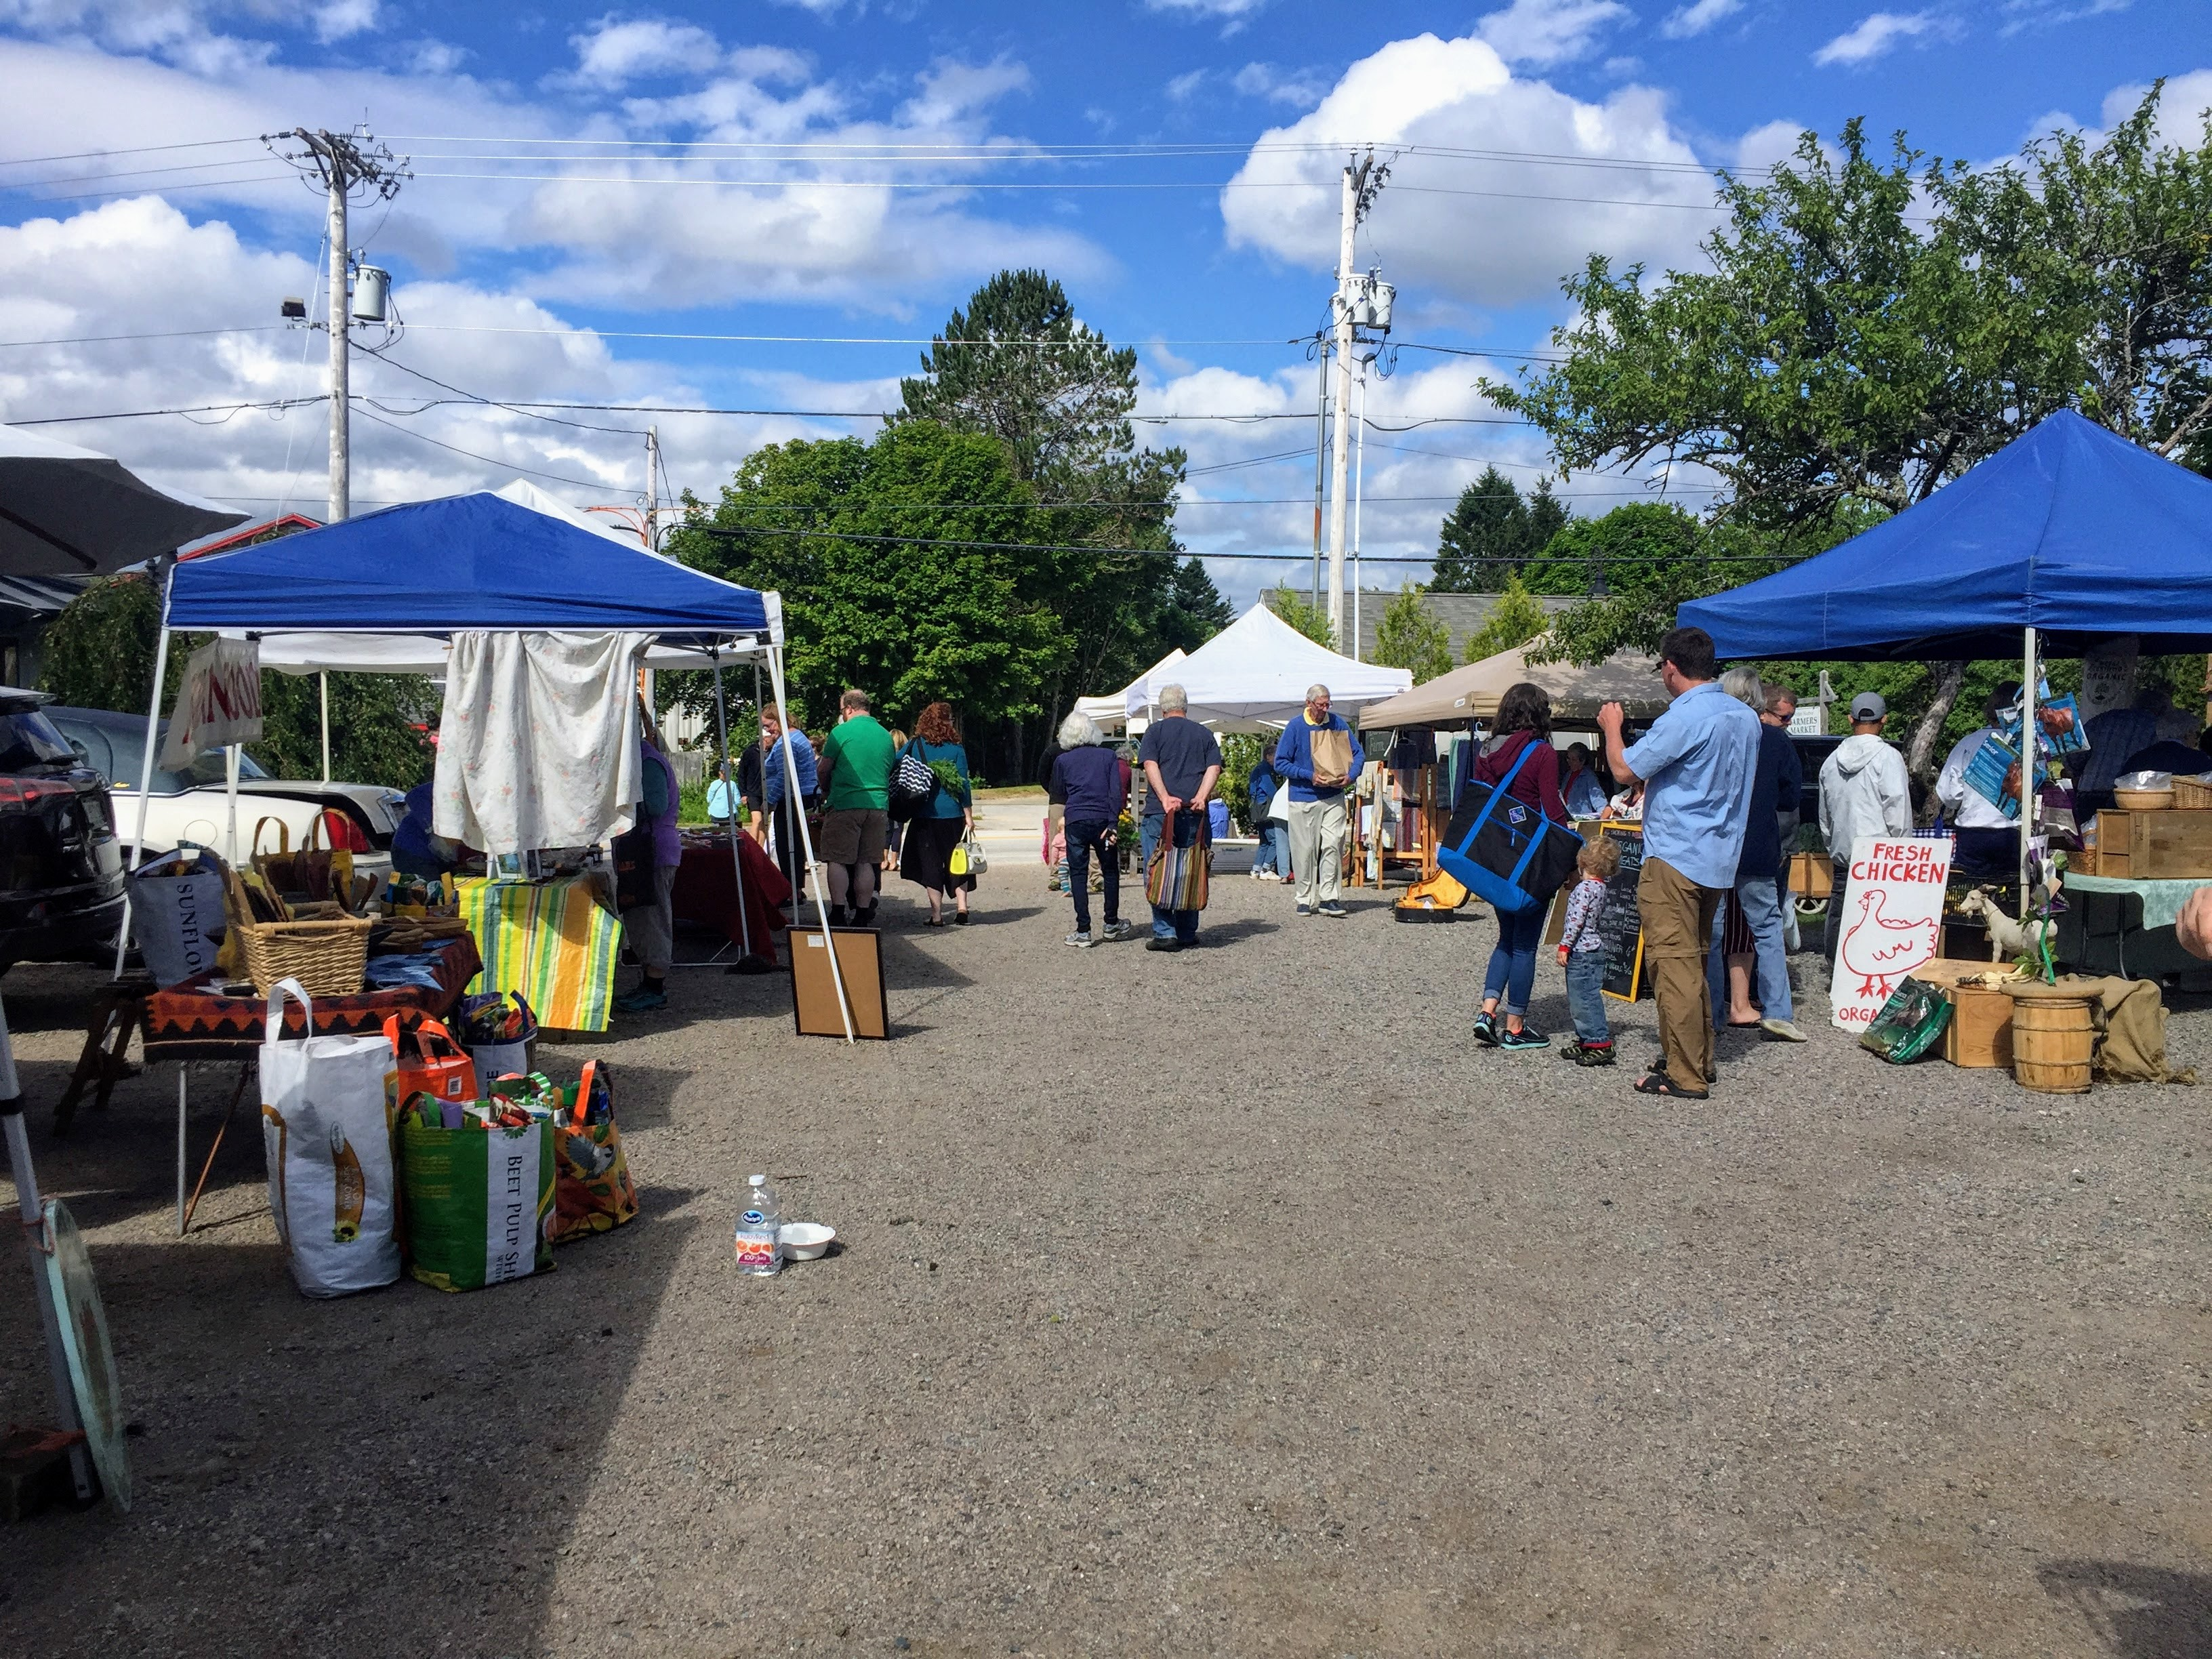 2017-07-25 Scoodic - Winter Harbor Farmers Market 02